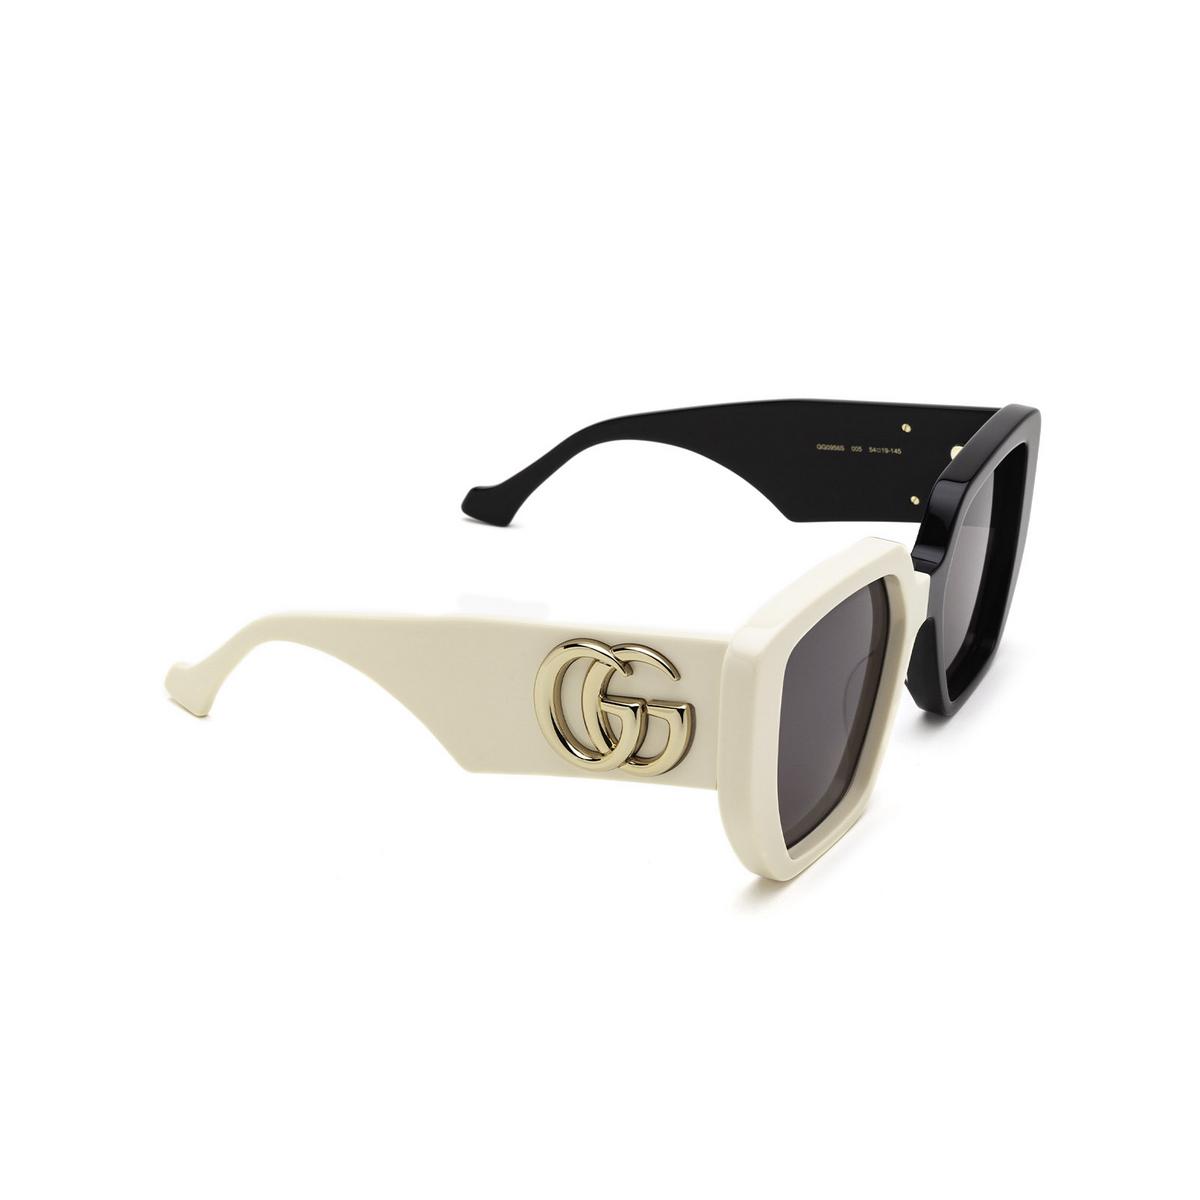 Gucci® Irregular Sunglasses: GG0956S color Black & Ivory 005 - three-quarters view.